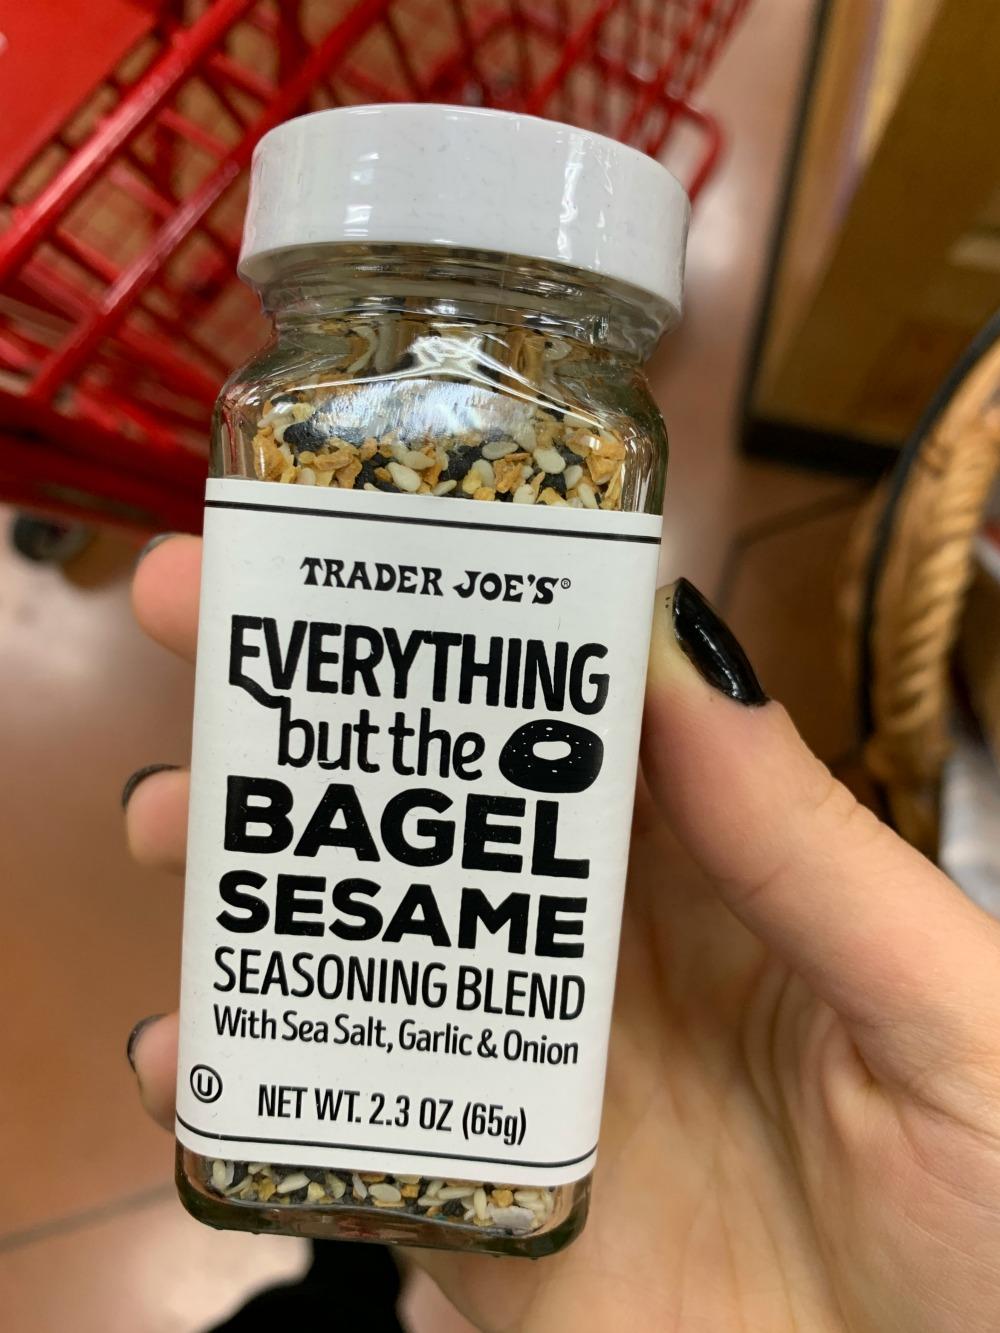 bottle of Everything but the Bagel seasoning mix